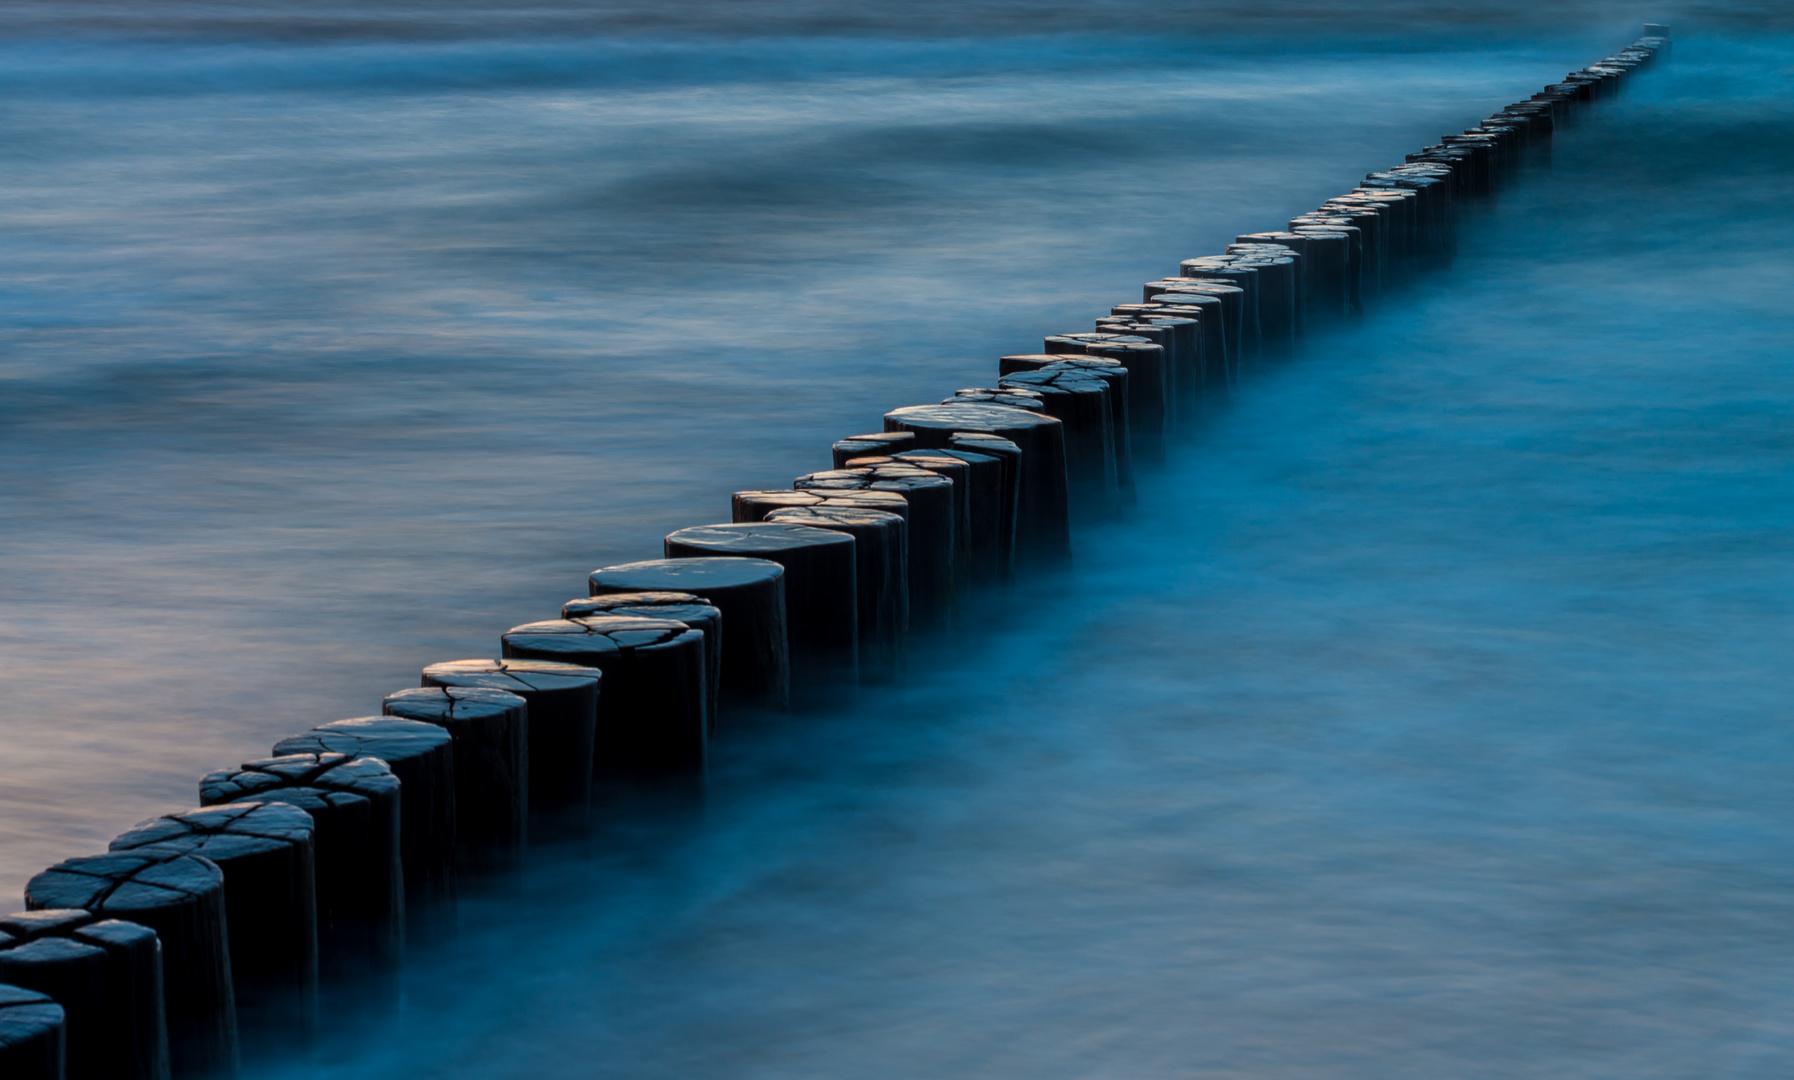 dividiert in blau